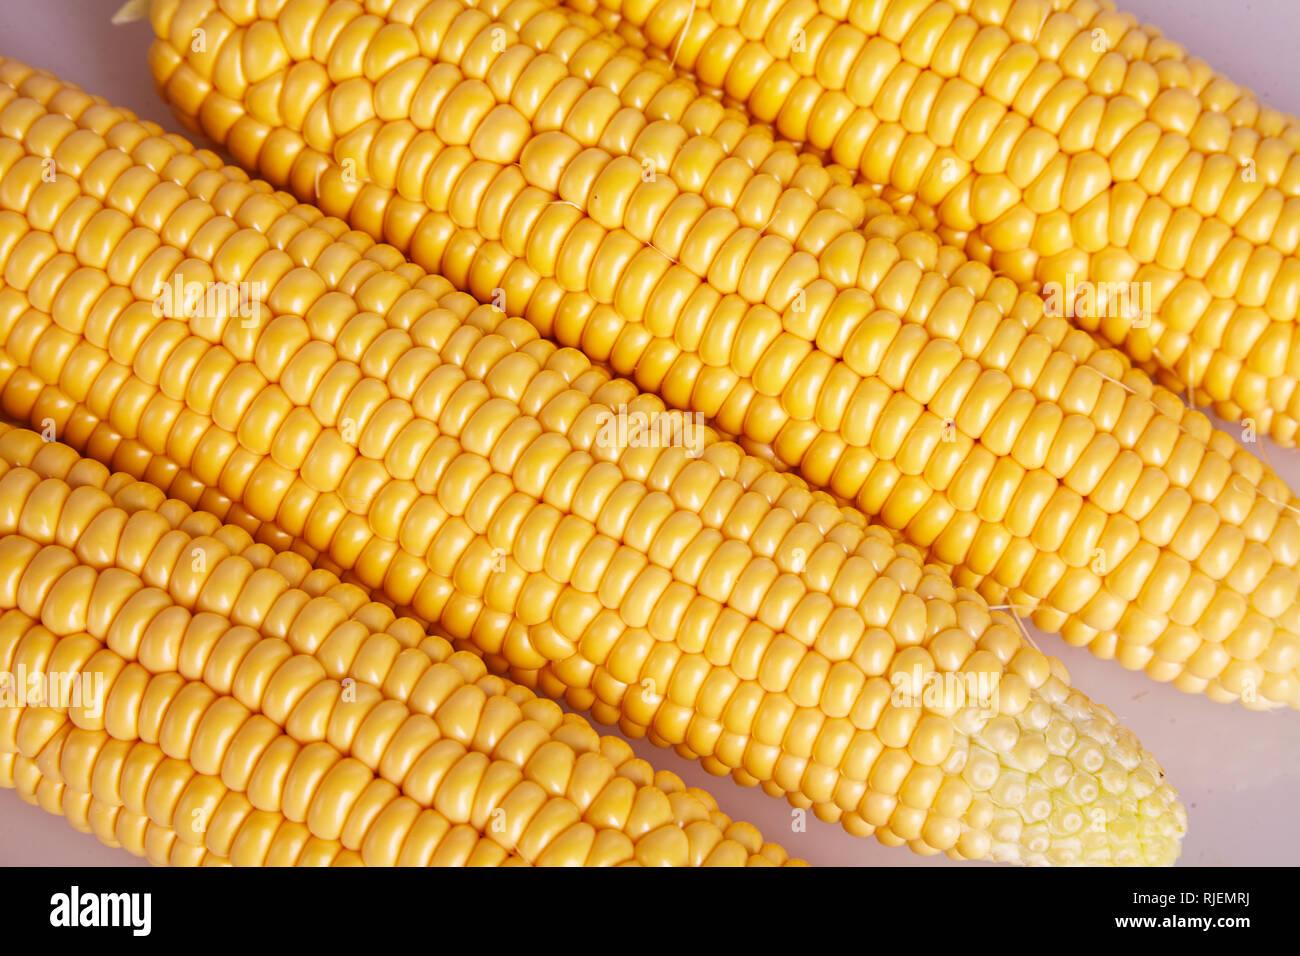 Fresh yellow corn cobs close up. Fresh vegetables. - Stock Image